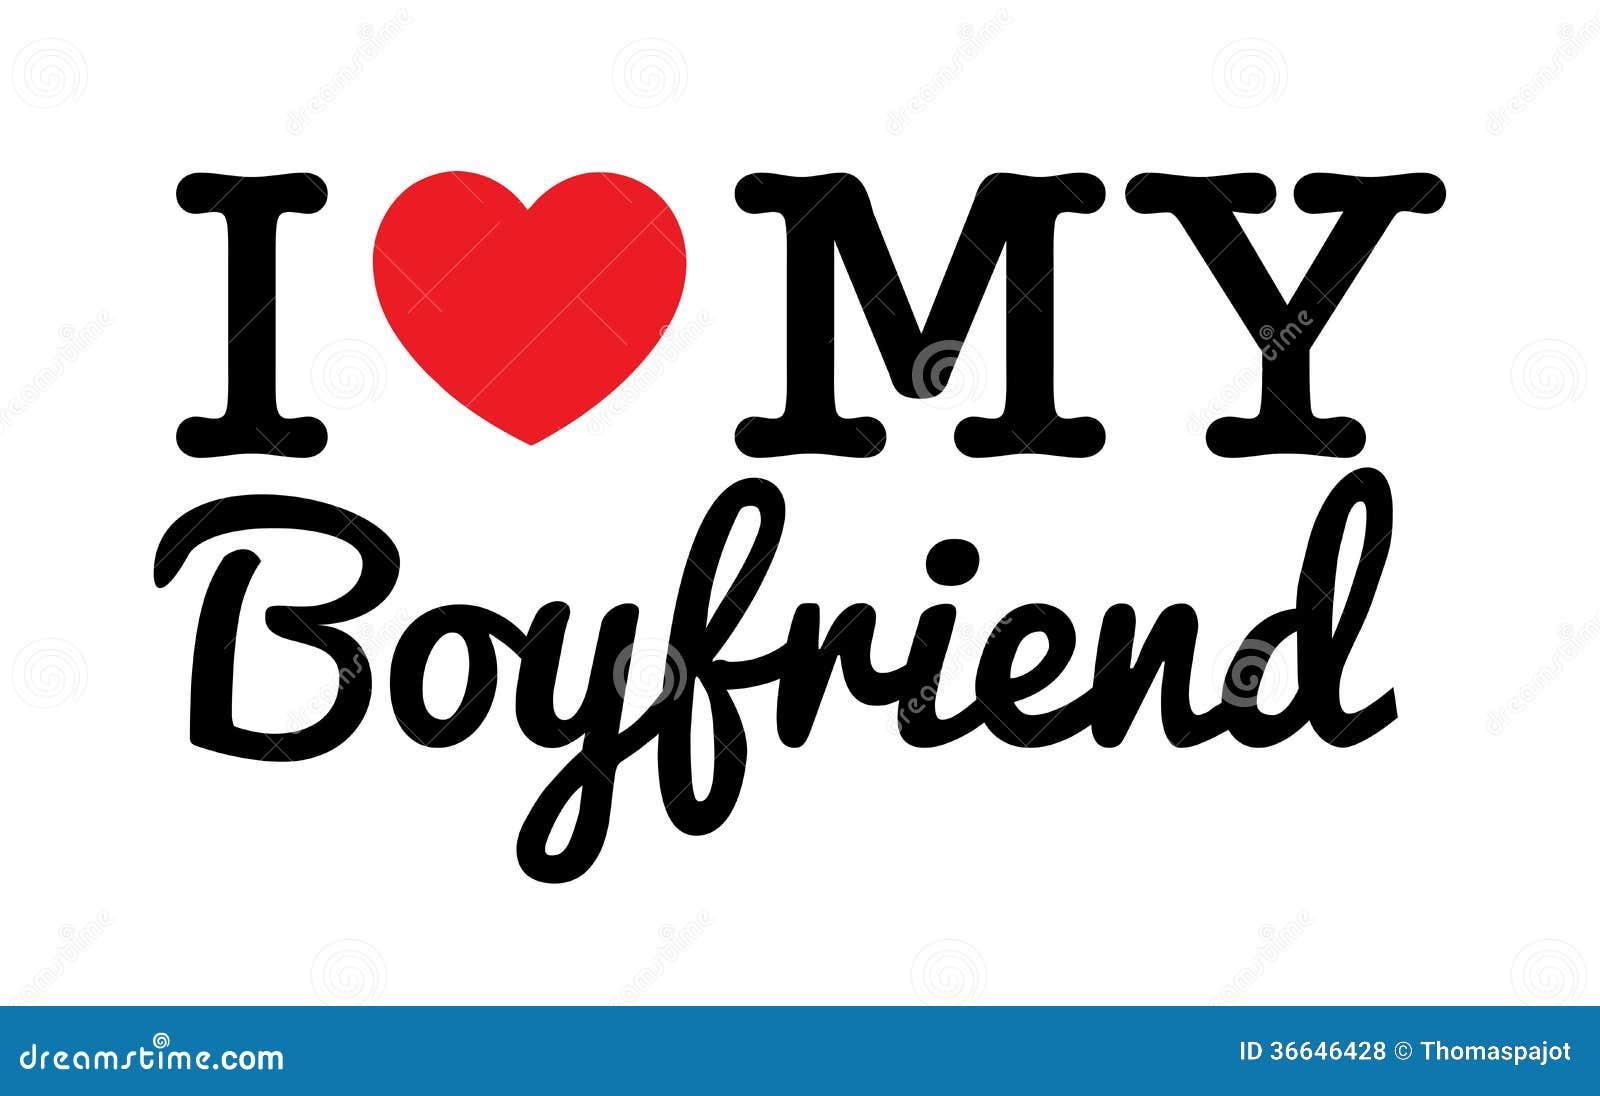 I Love My Boyfriend Stock Vector Illustration Of Heart 36646428